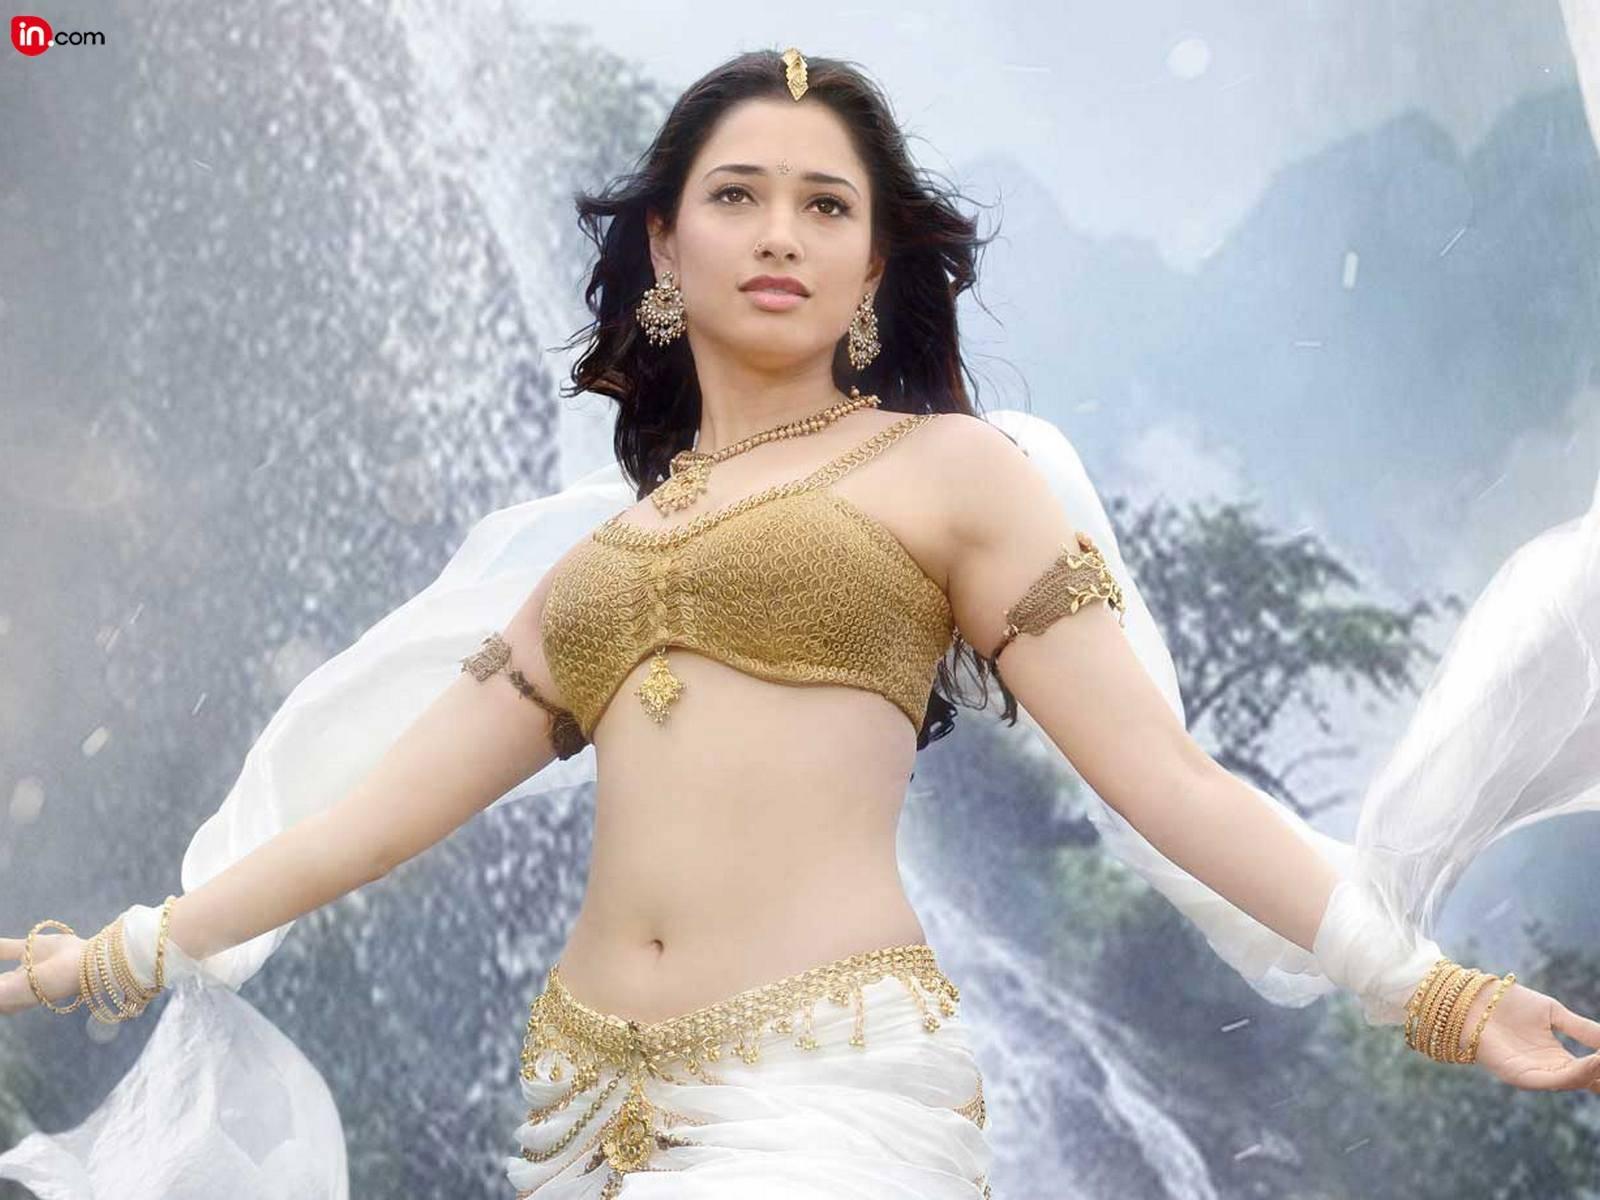 Tamanna bhatia hd clipart download.